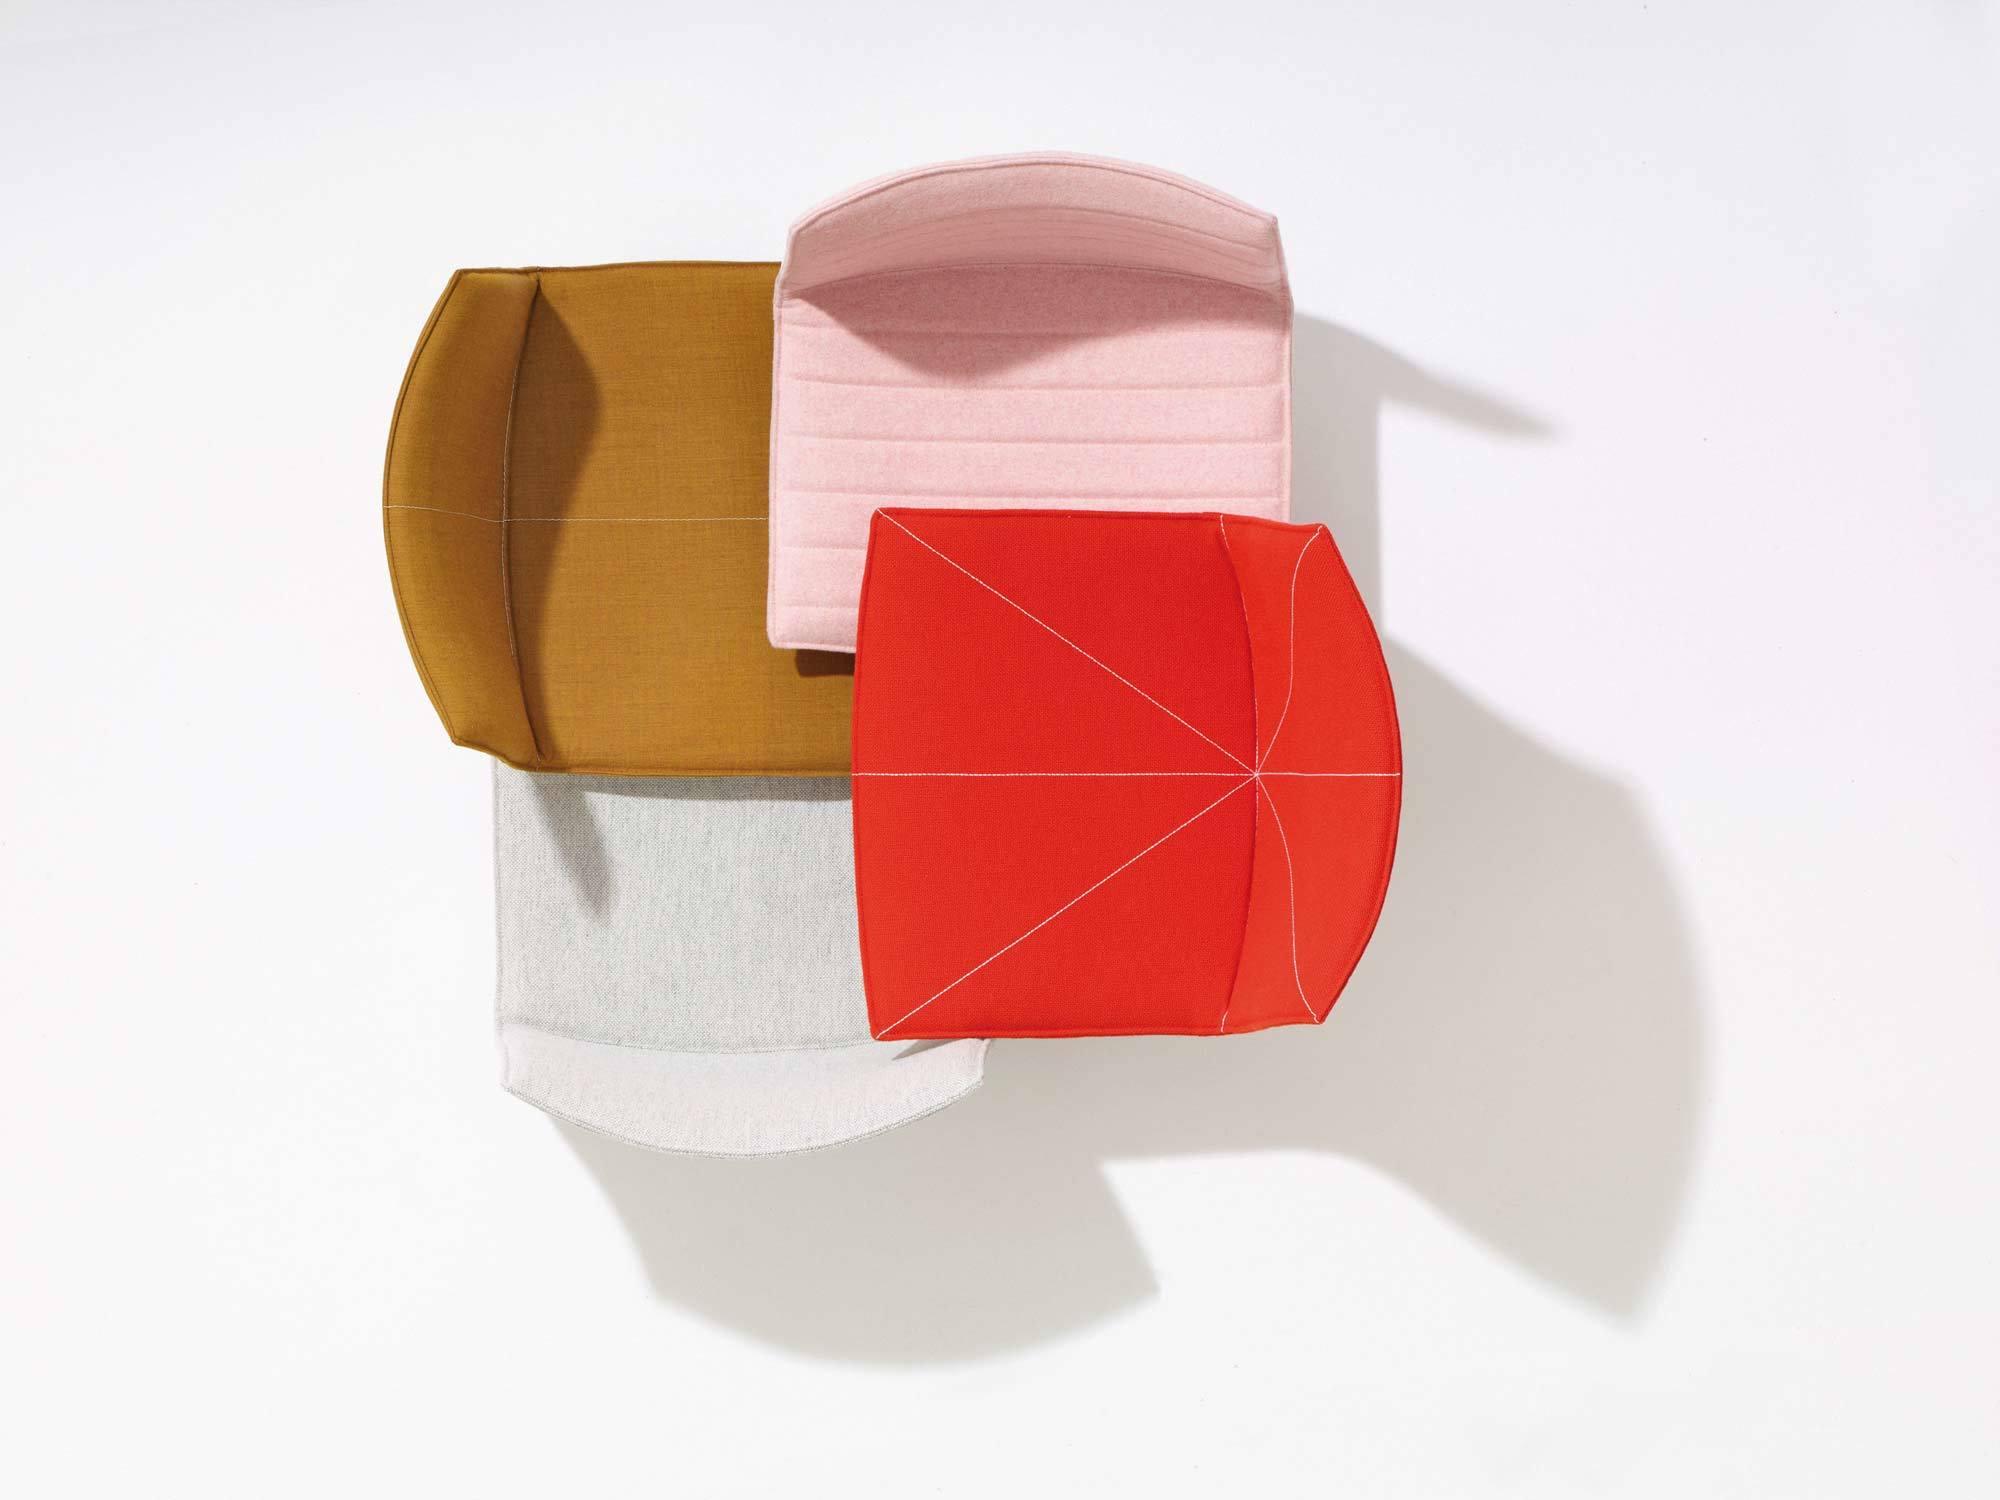 Catifa 53 für Arper, Design: Lievore Altherr Molina, 2001